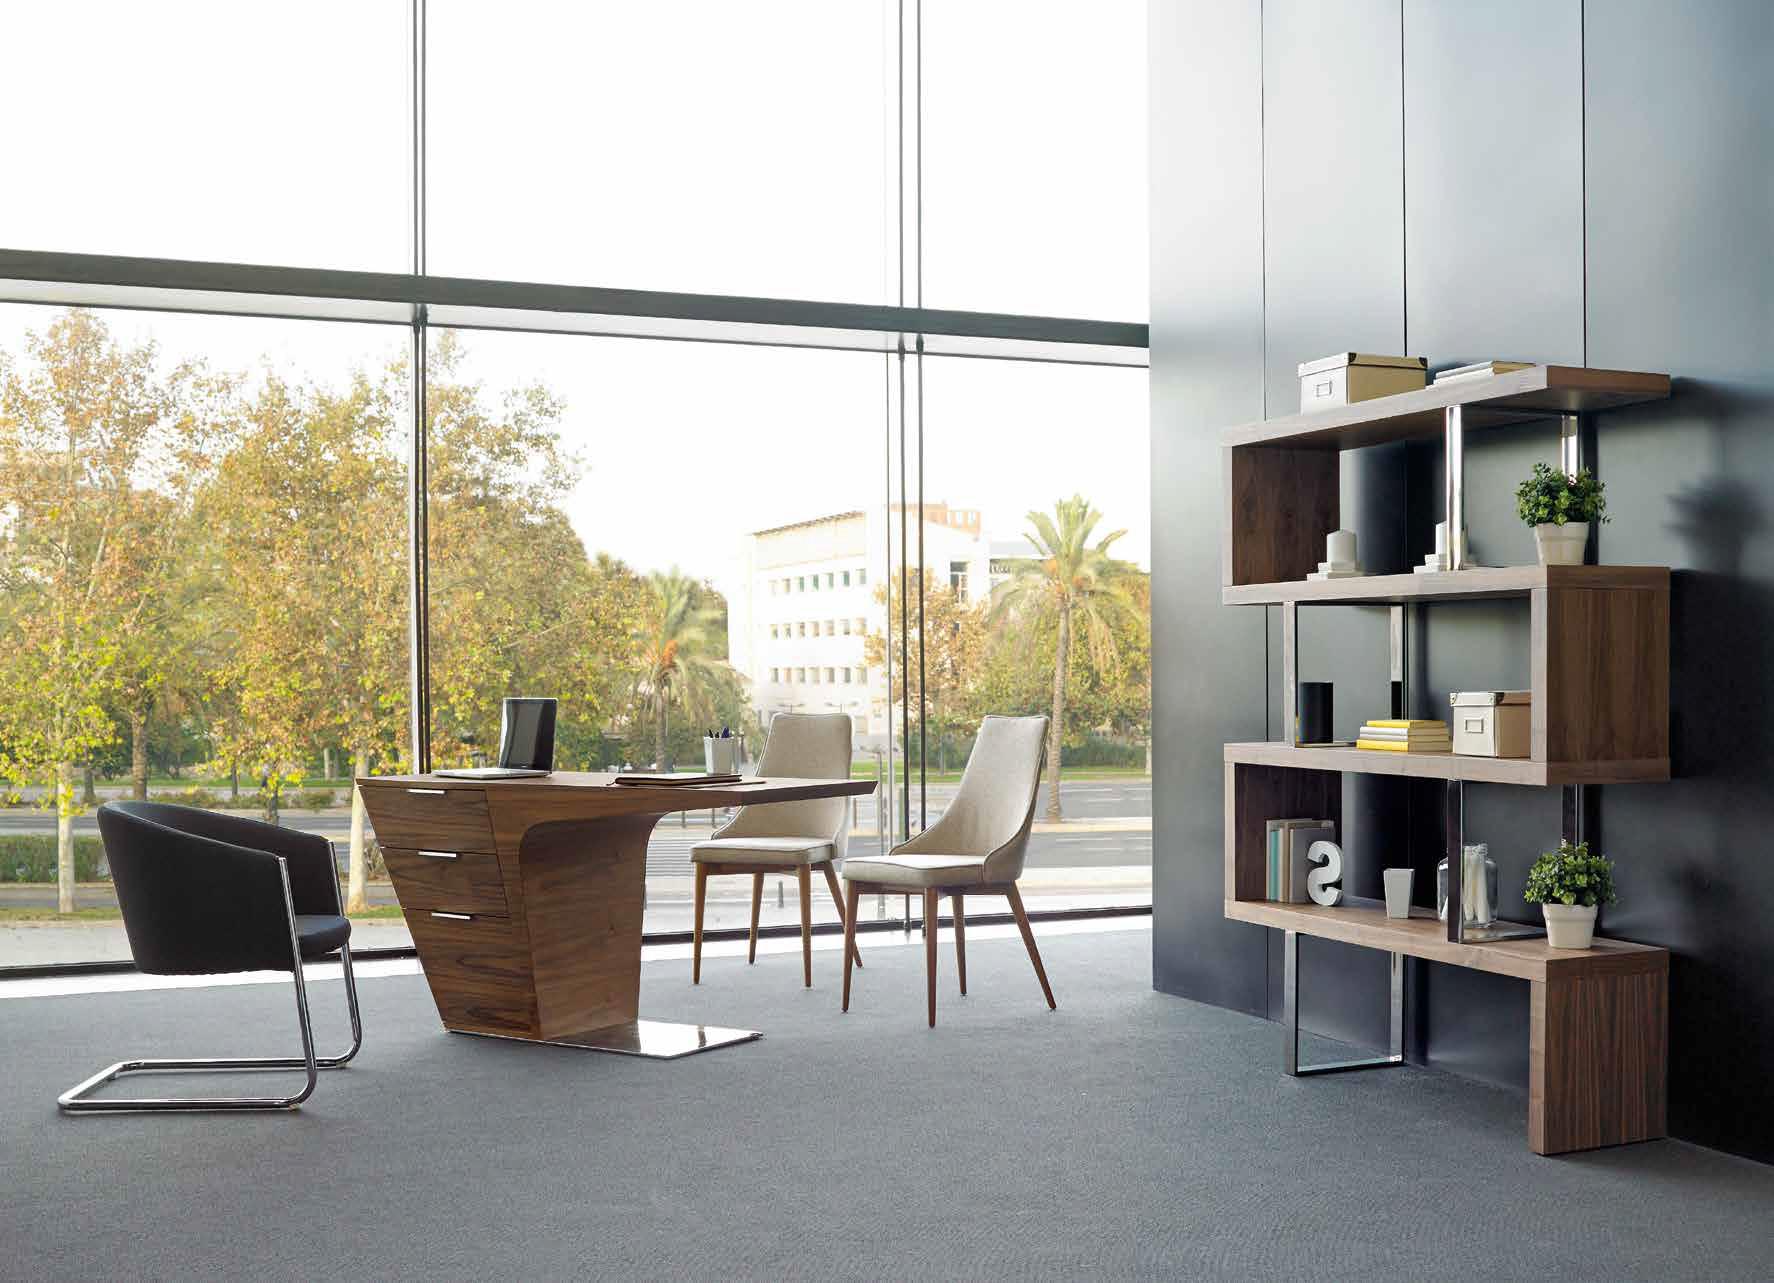 mesa de oficina dise o pesaro muebles d azmuebles d az